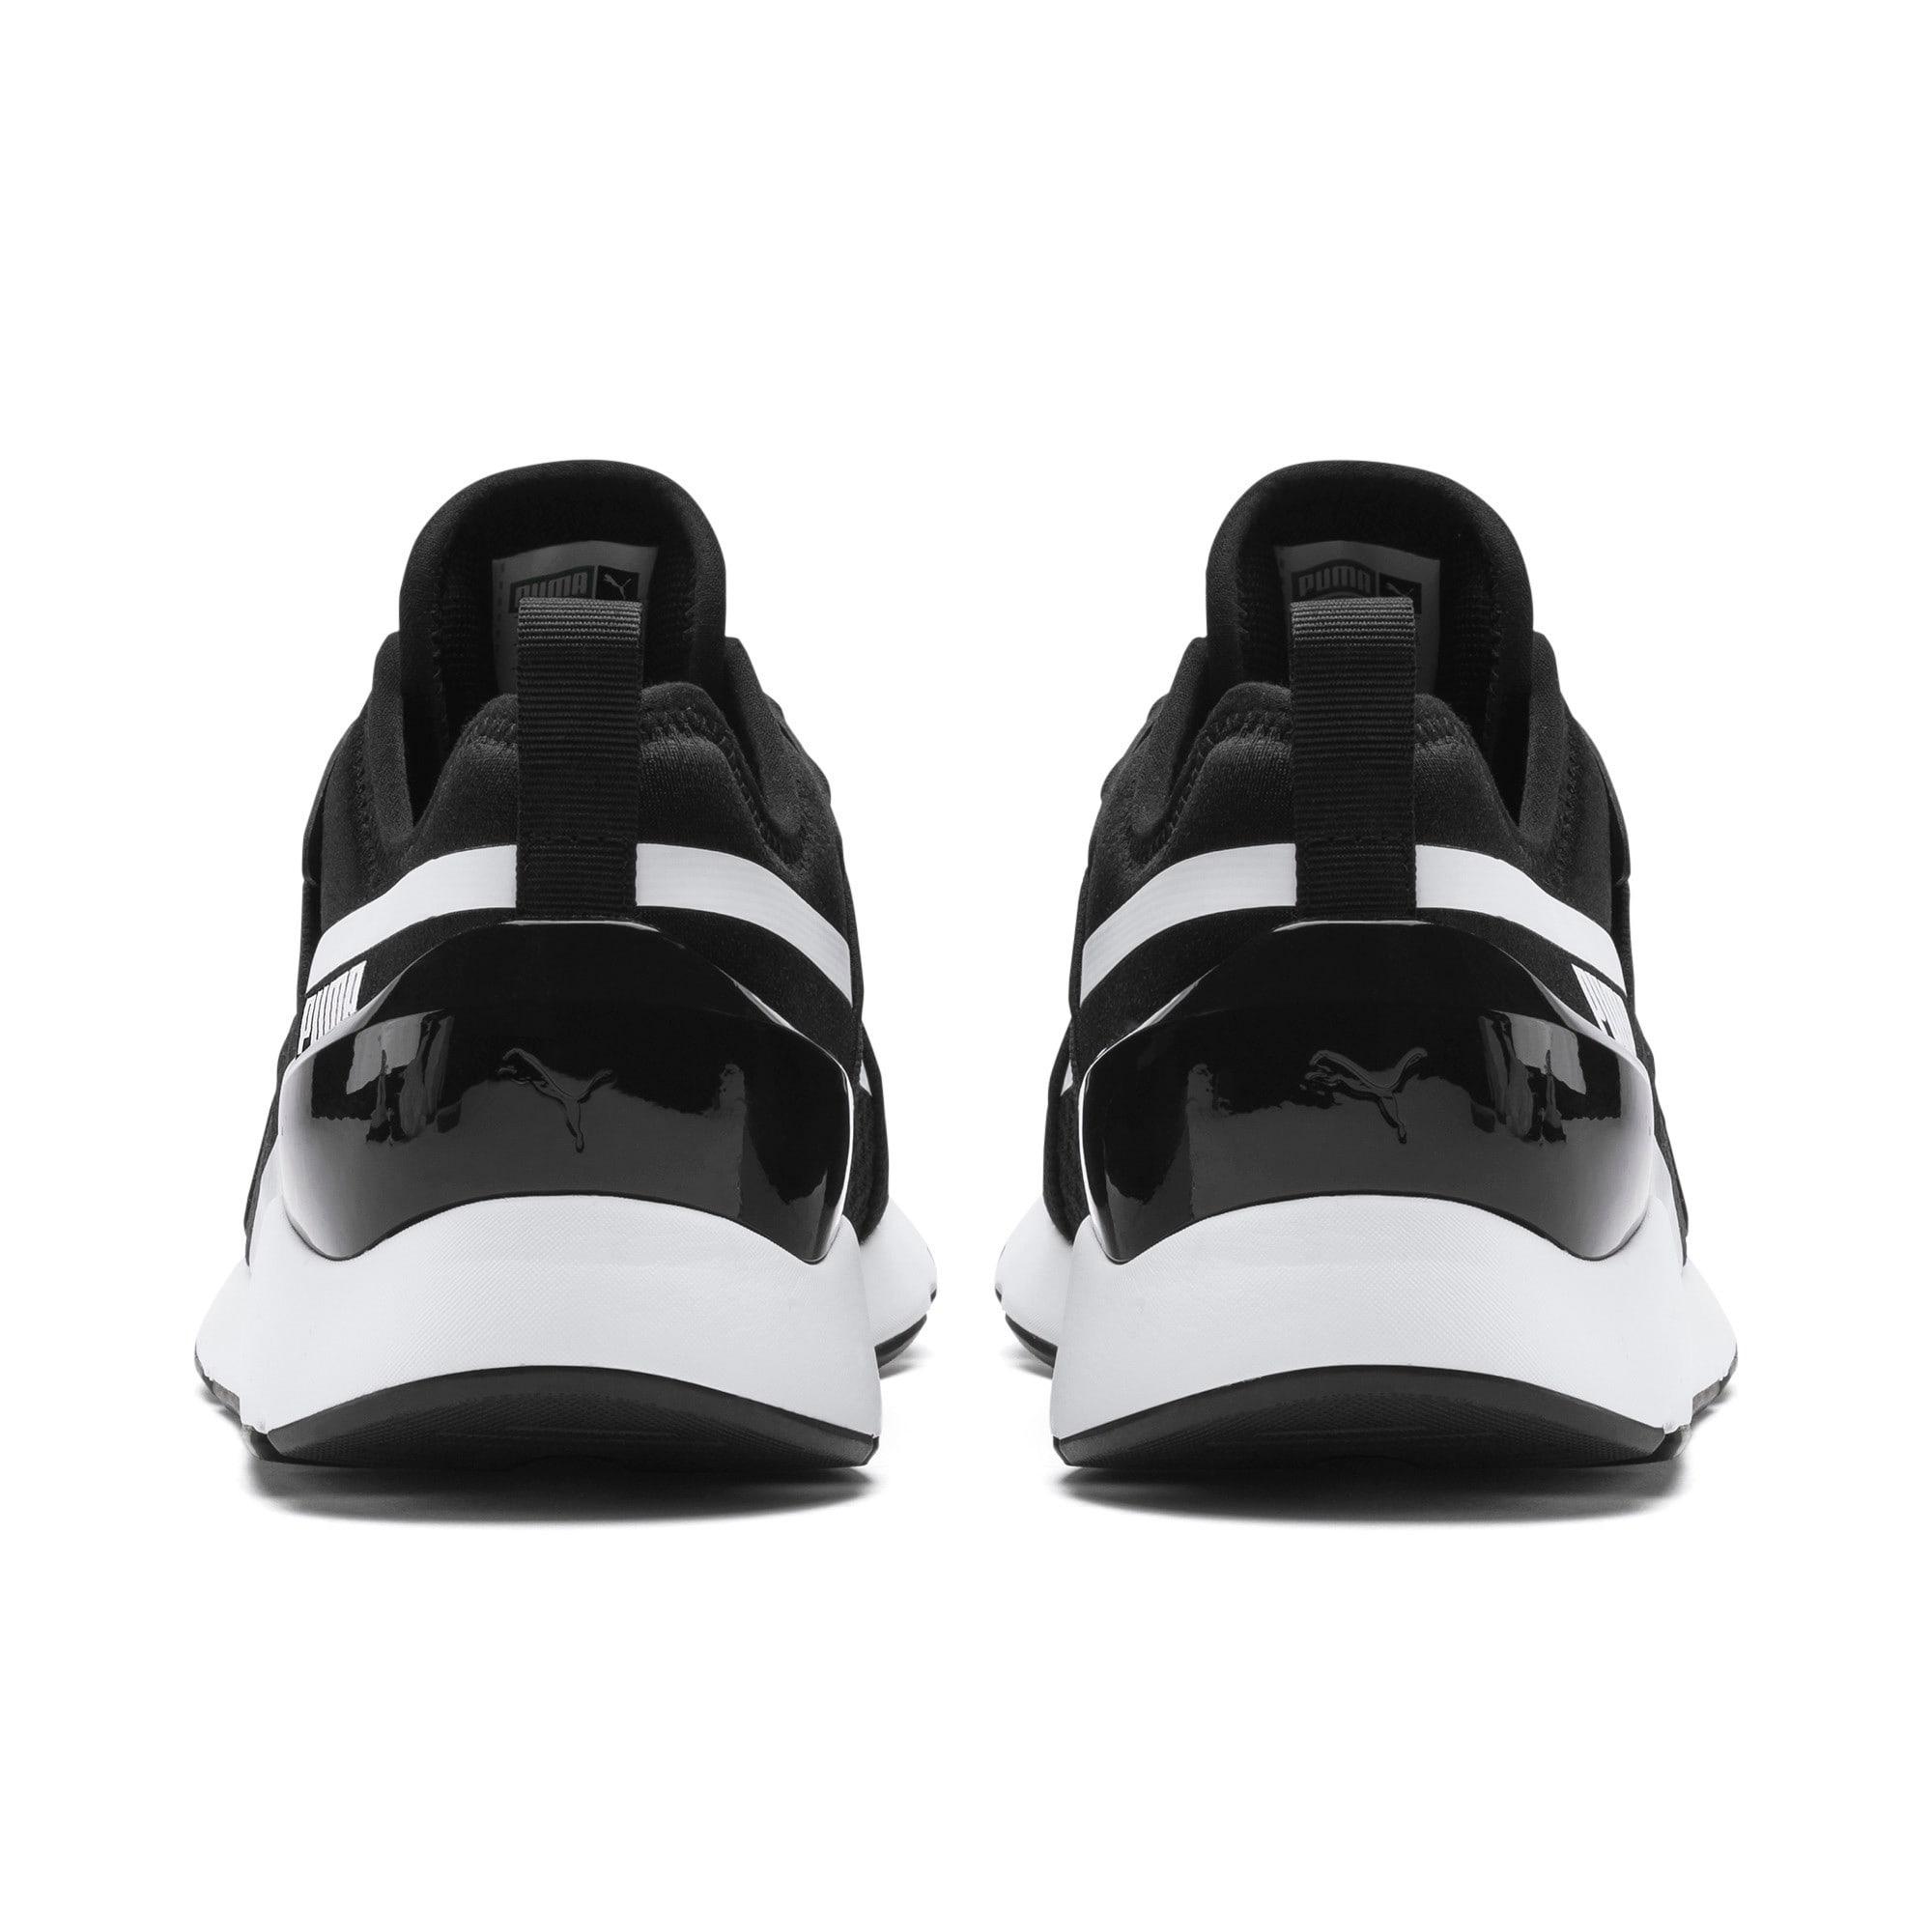 Thumbnail 3 of Muse X-2 Women's Sneakers, Puma Black-Puma White, medium